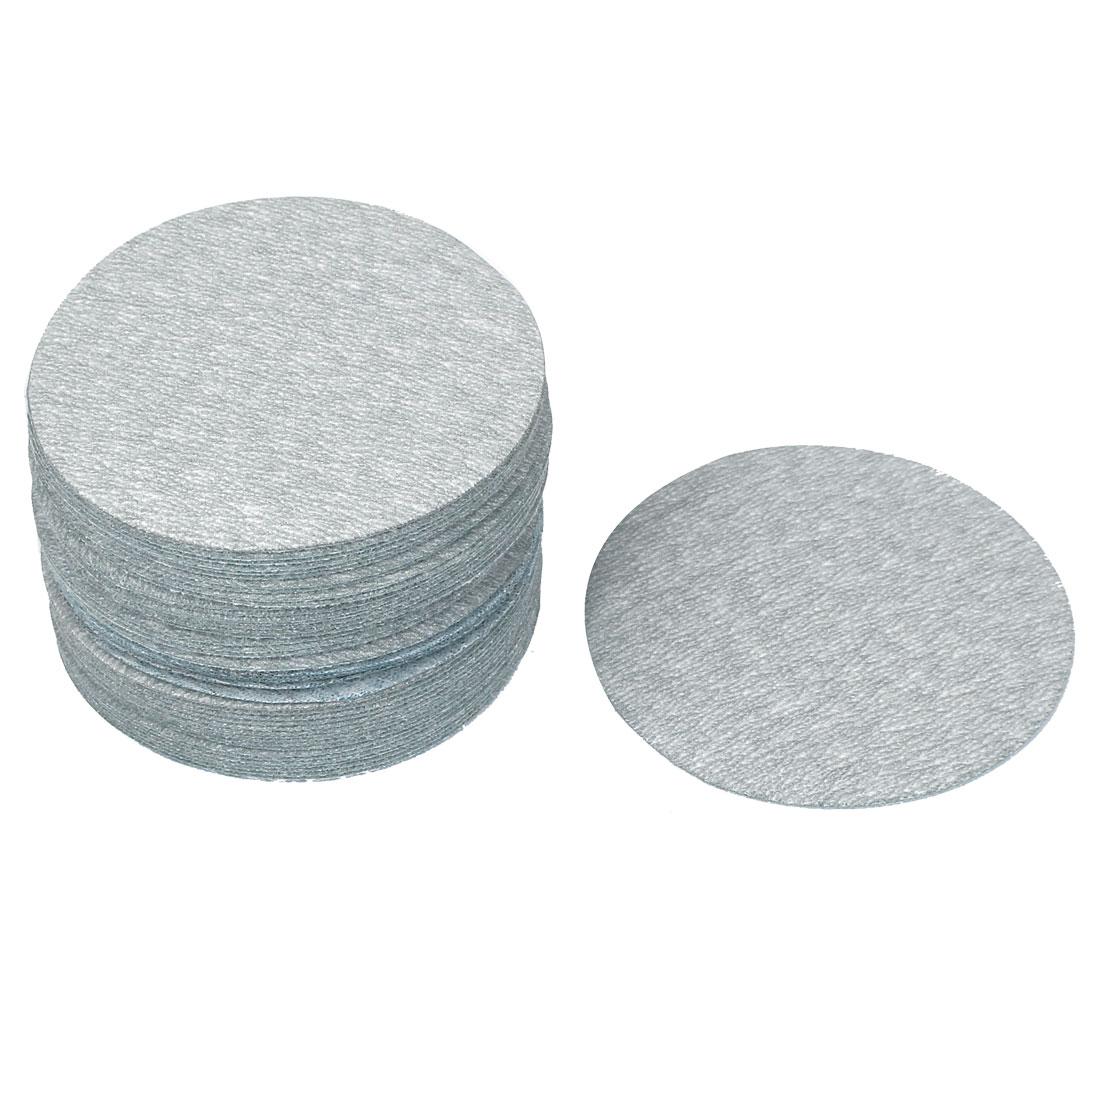 "3"" Dia Polishing Round Dry Abrasive Sanding Sandpaper Sheet Disc 600 Grit 50pcs"